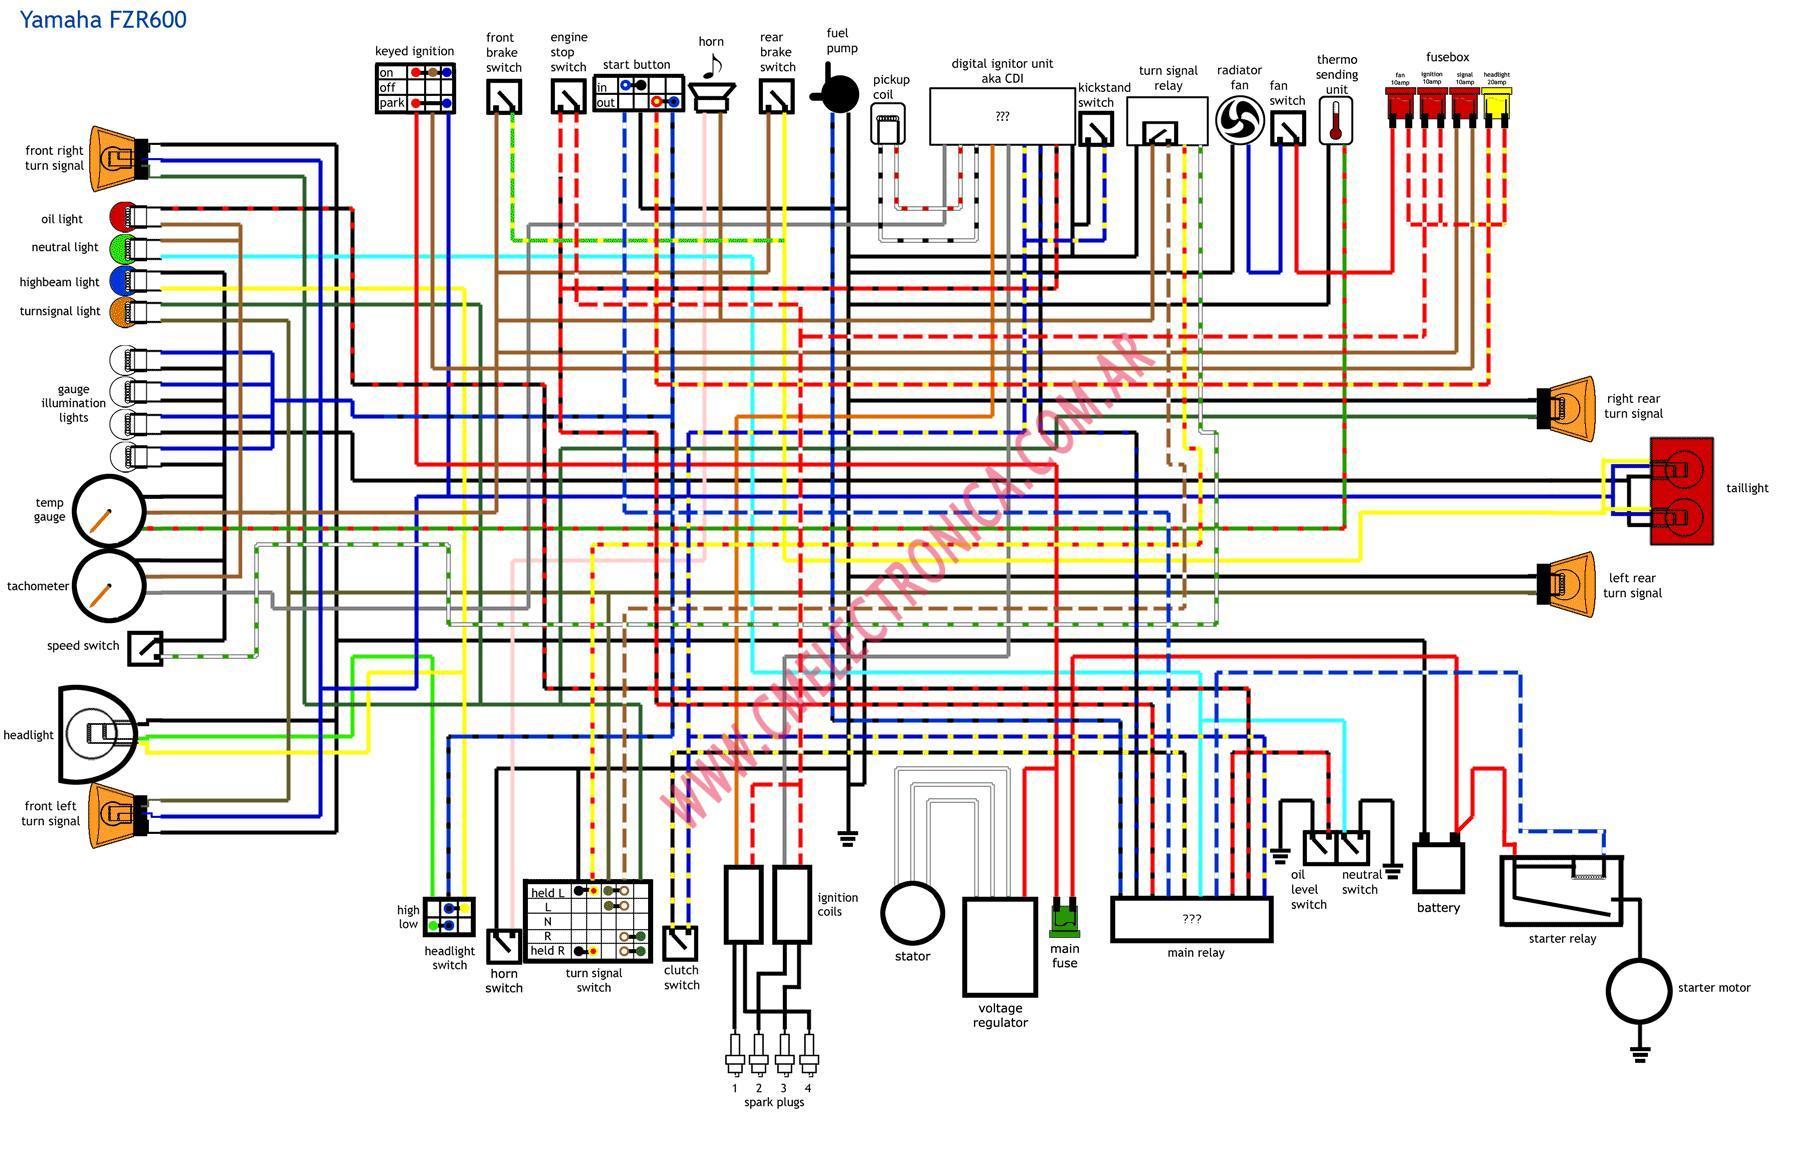 1986 Honda Accord Motor Spark Plug Diagram